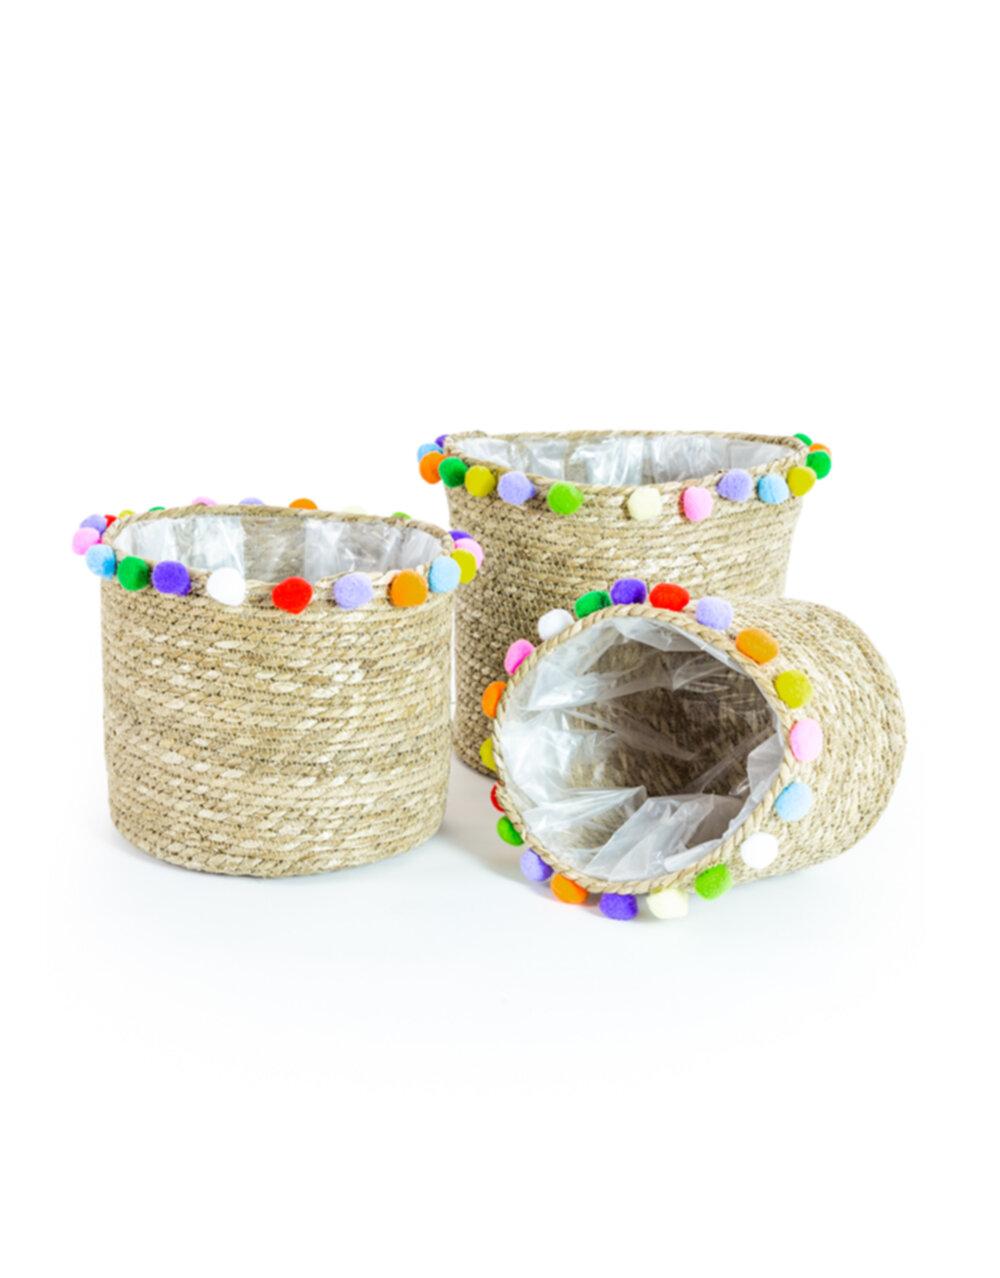 Set of 3 Rustic Weaved Storage Pom Pom Baskets/Plant Pot Baskets